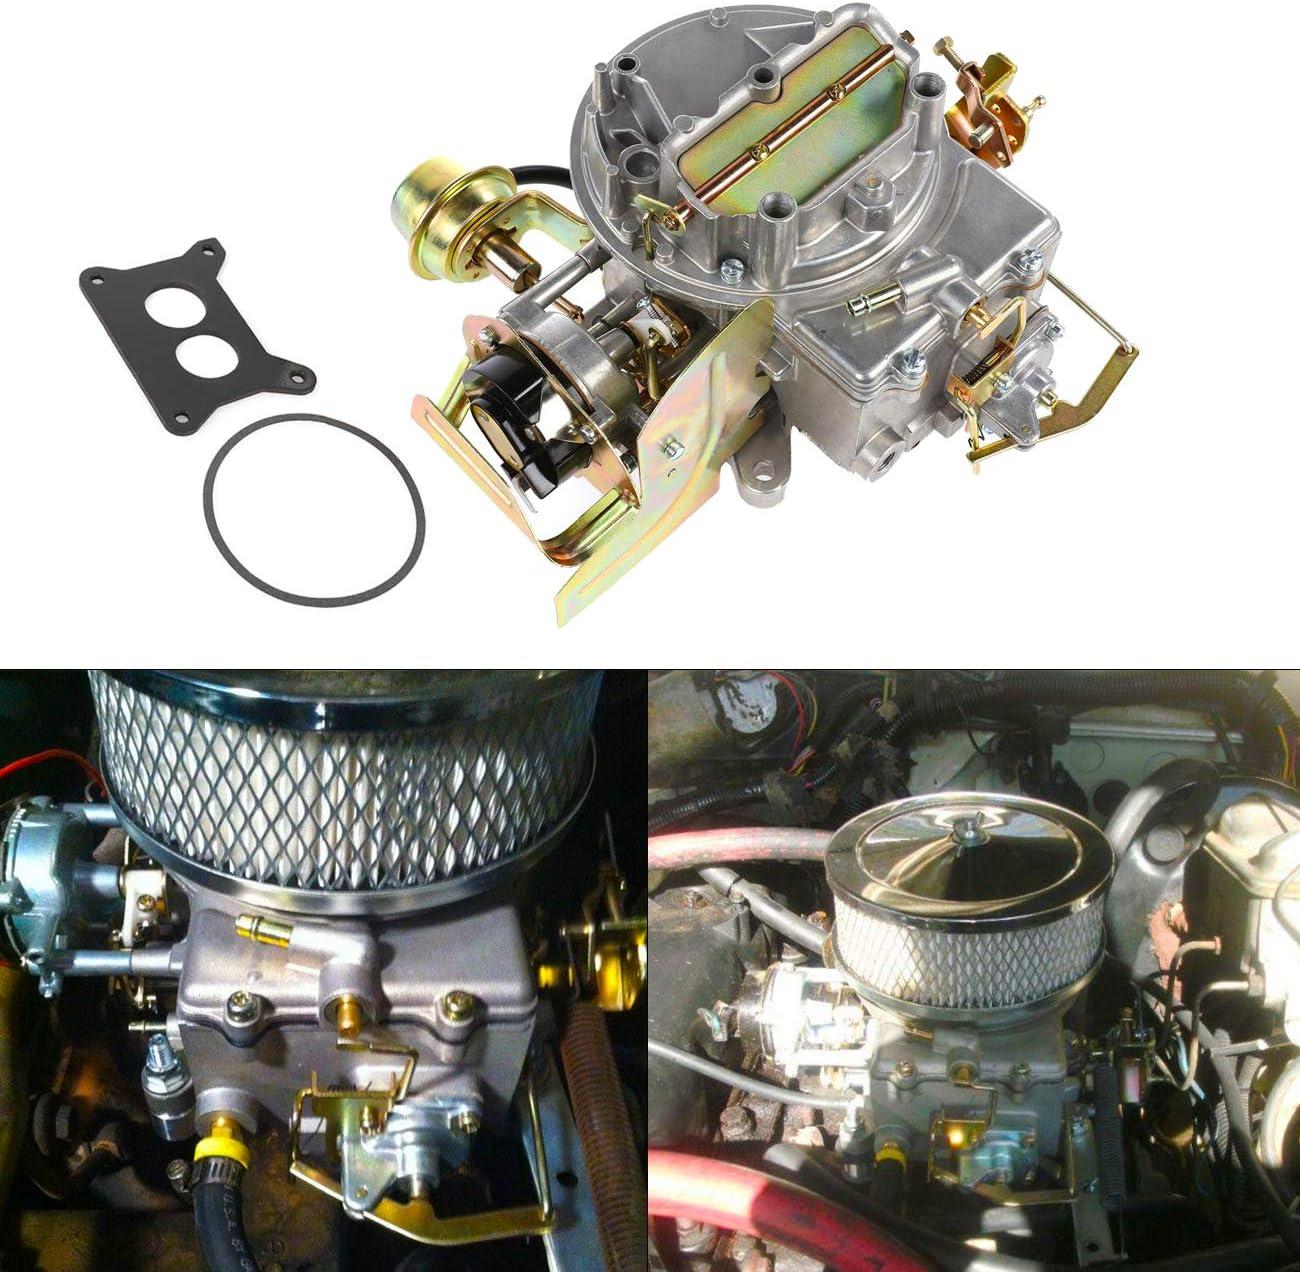 Amazon.com: ALAVENTE Carburetor Carb for Ford F150 F250 F350 MUSTANG 2100 2  BARREL Engine 289 302 351 & JEEP 360 (Automatic Choke): AutomotiveAmazon.com